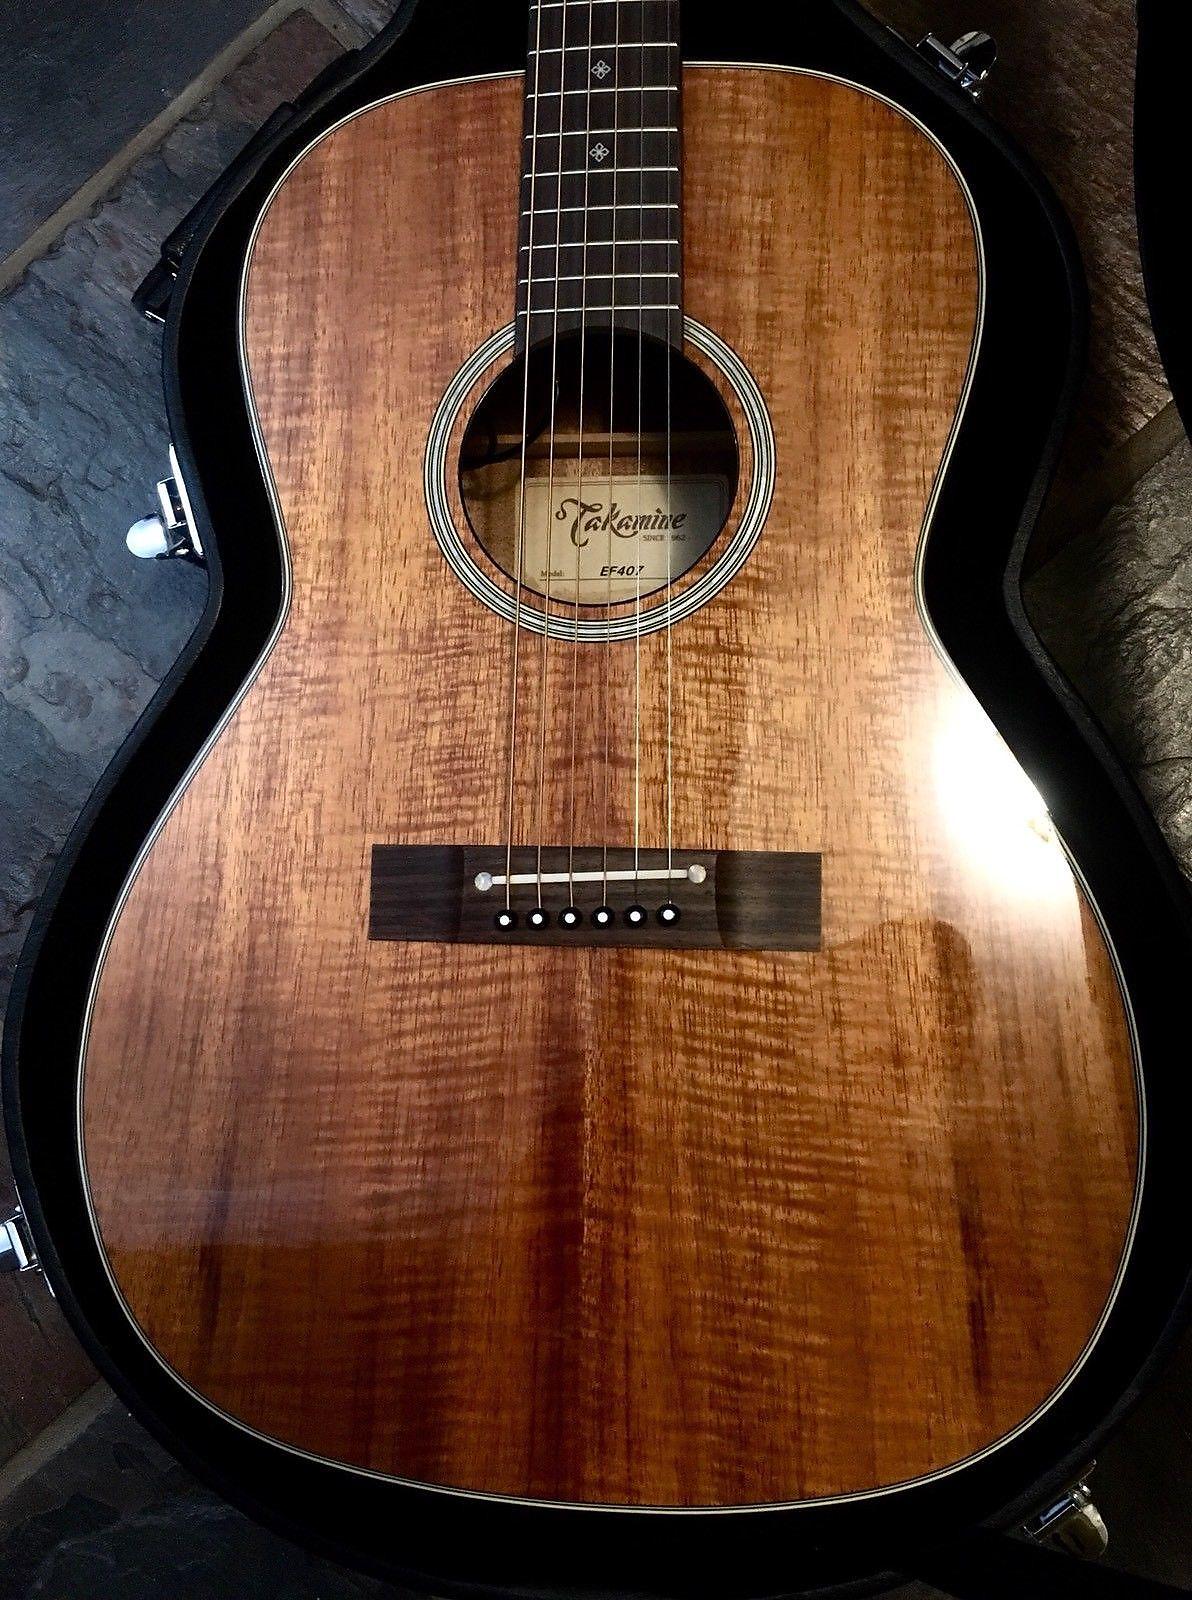 Takamine Ef407 Legacy Series Acoustic Guitar In Gloss Natural Finish Guitars & Basses